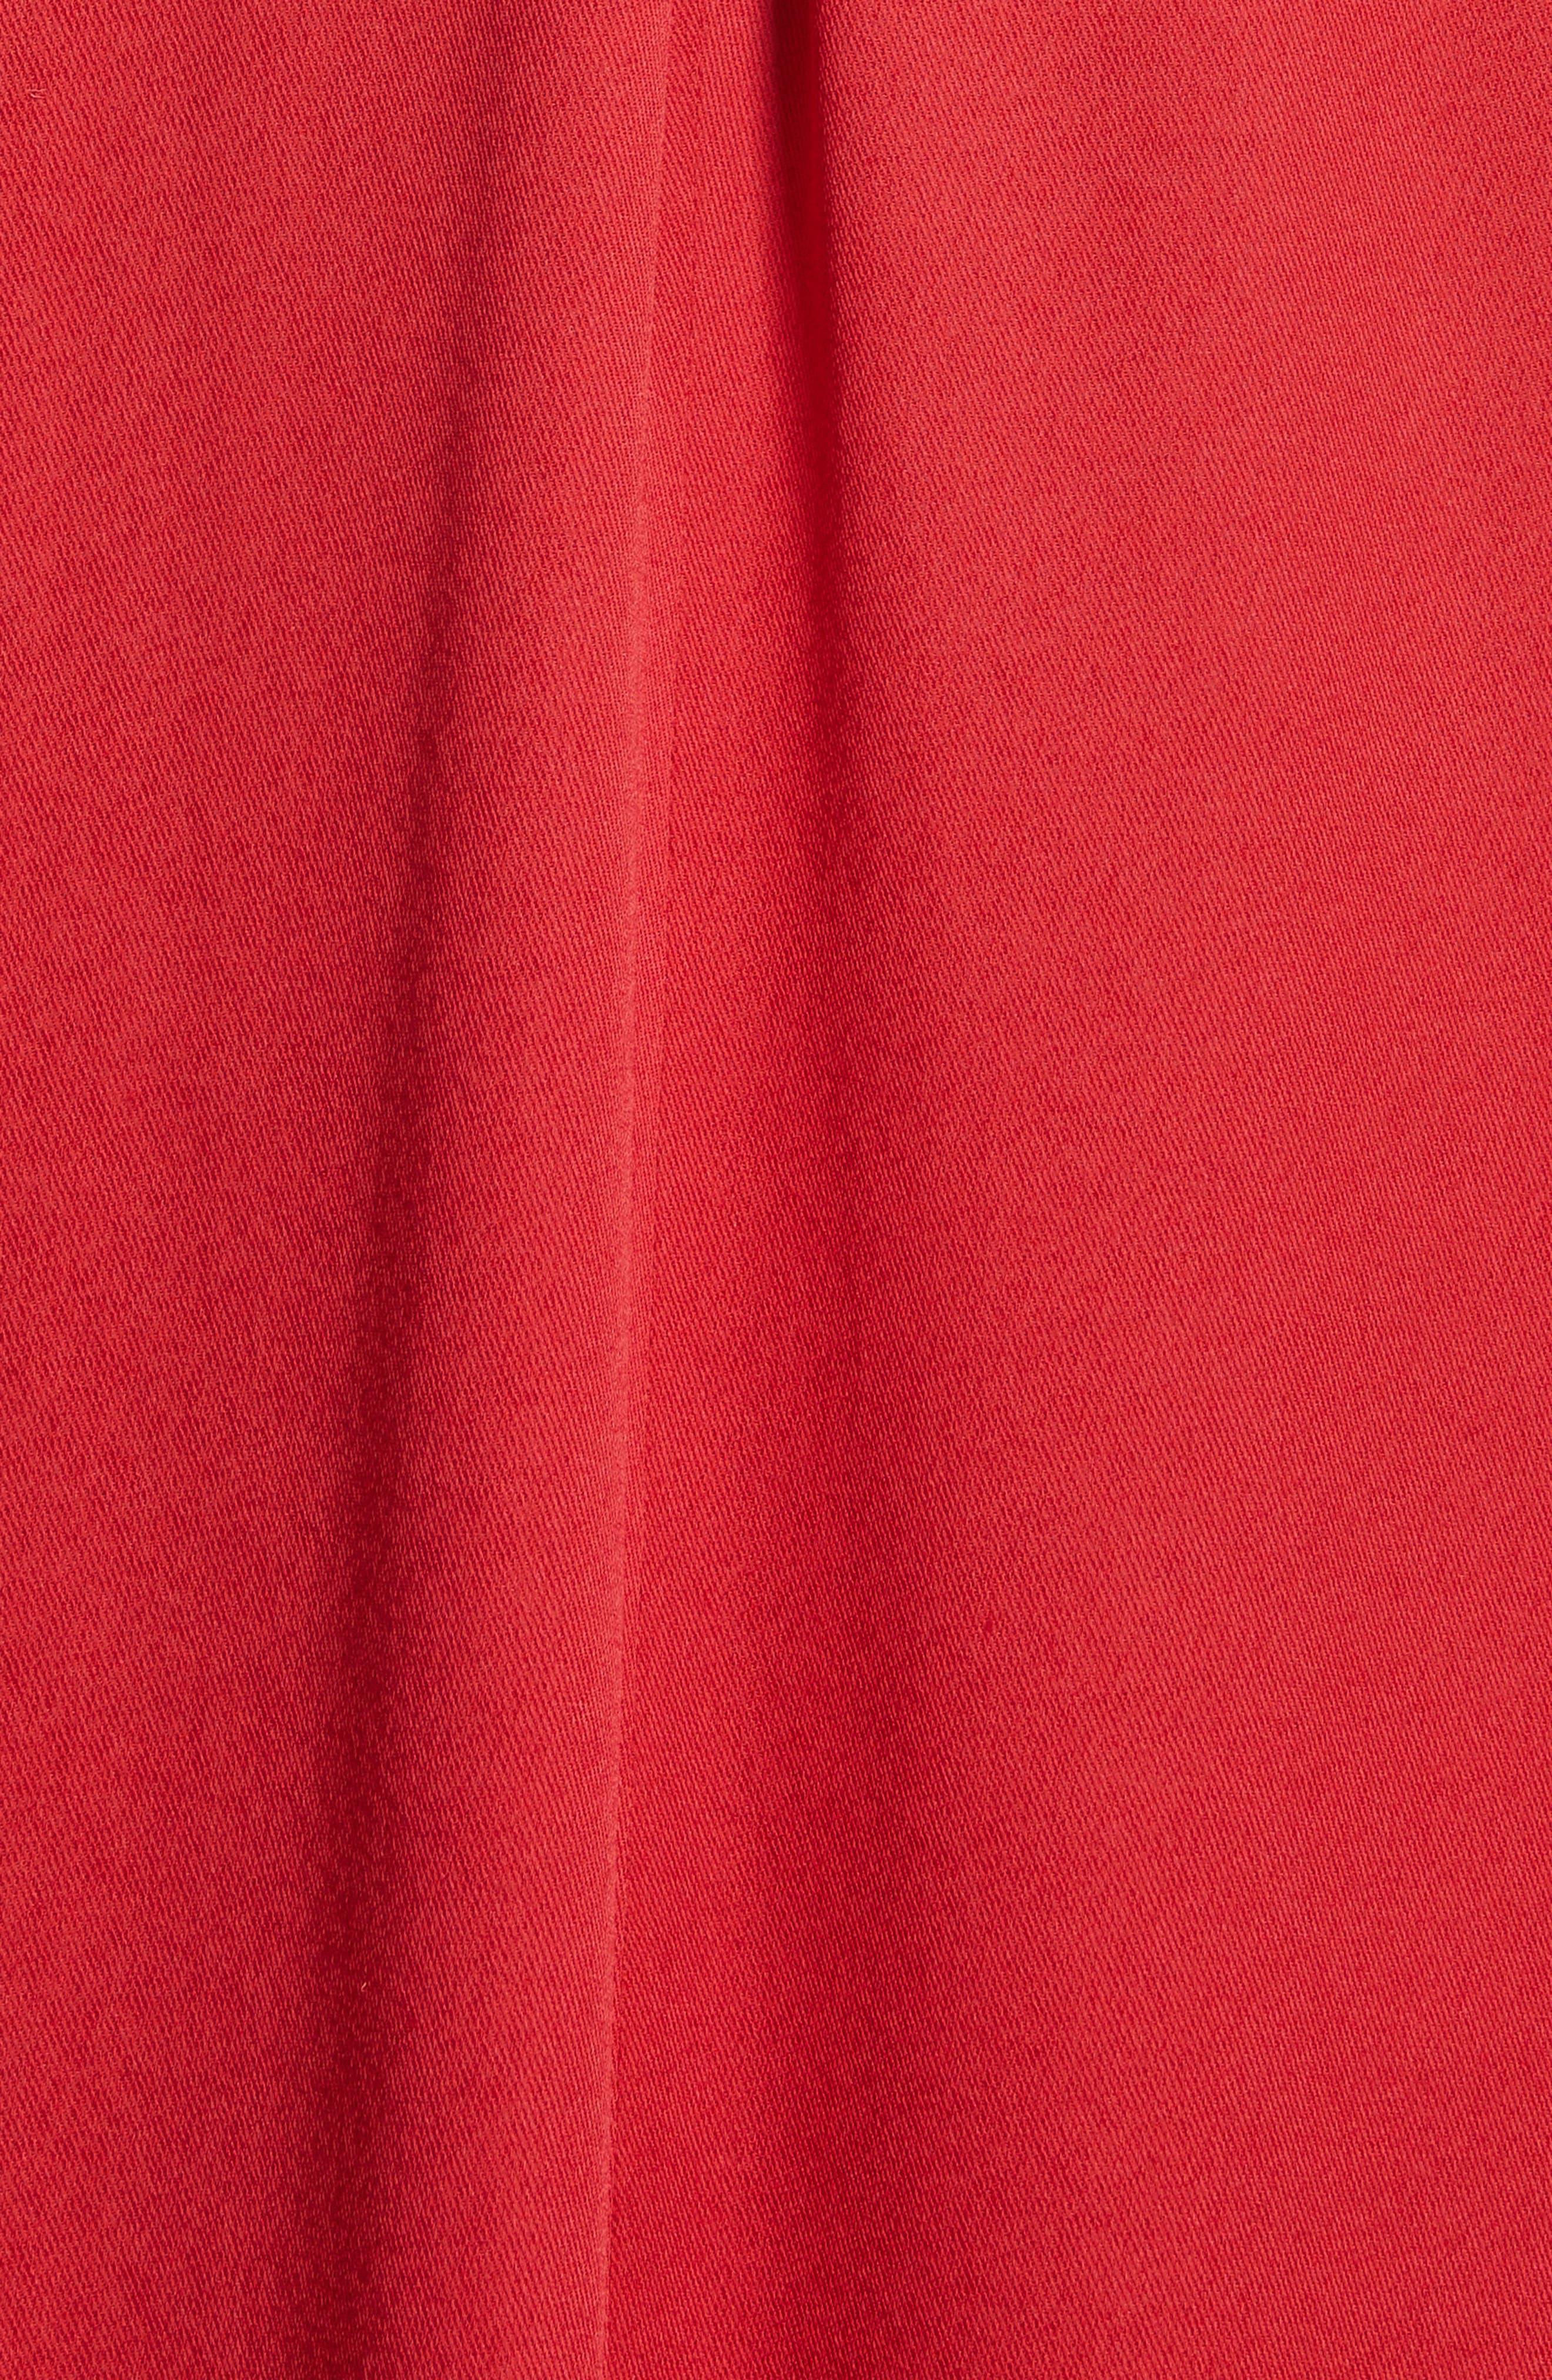 Eco Gathered Maxi Dress,                             Alternate thumbnail 5, color,